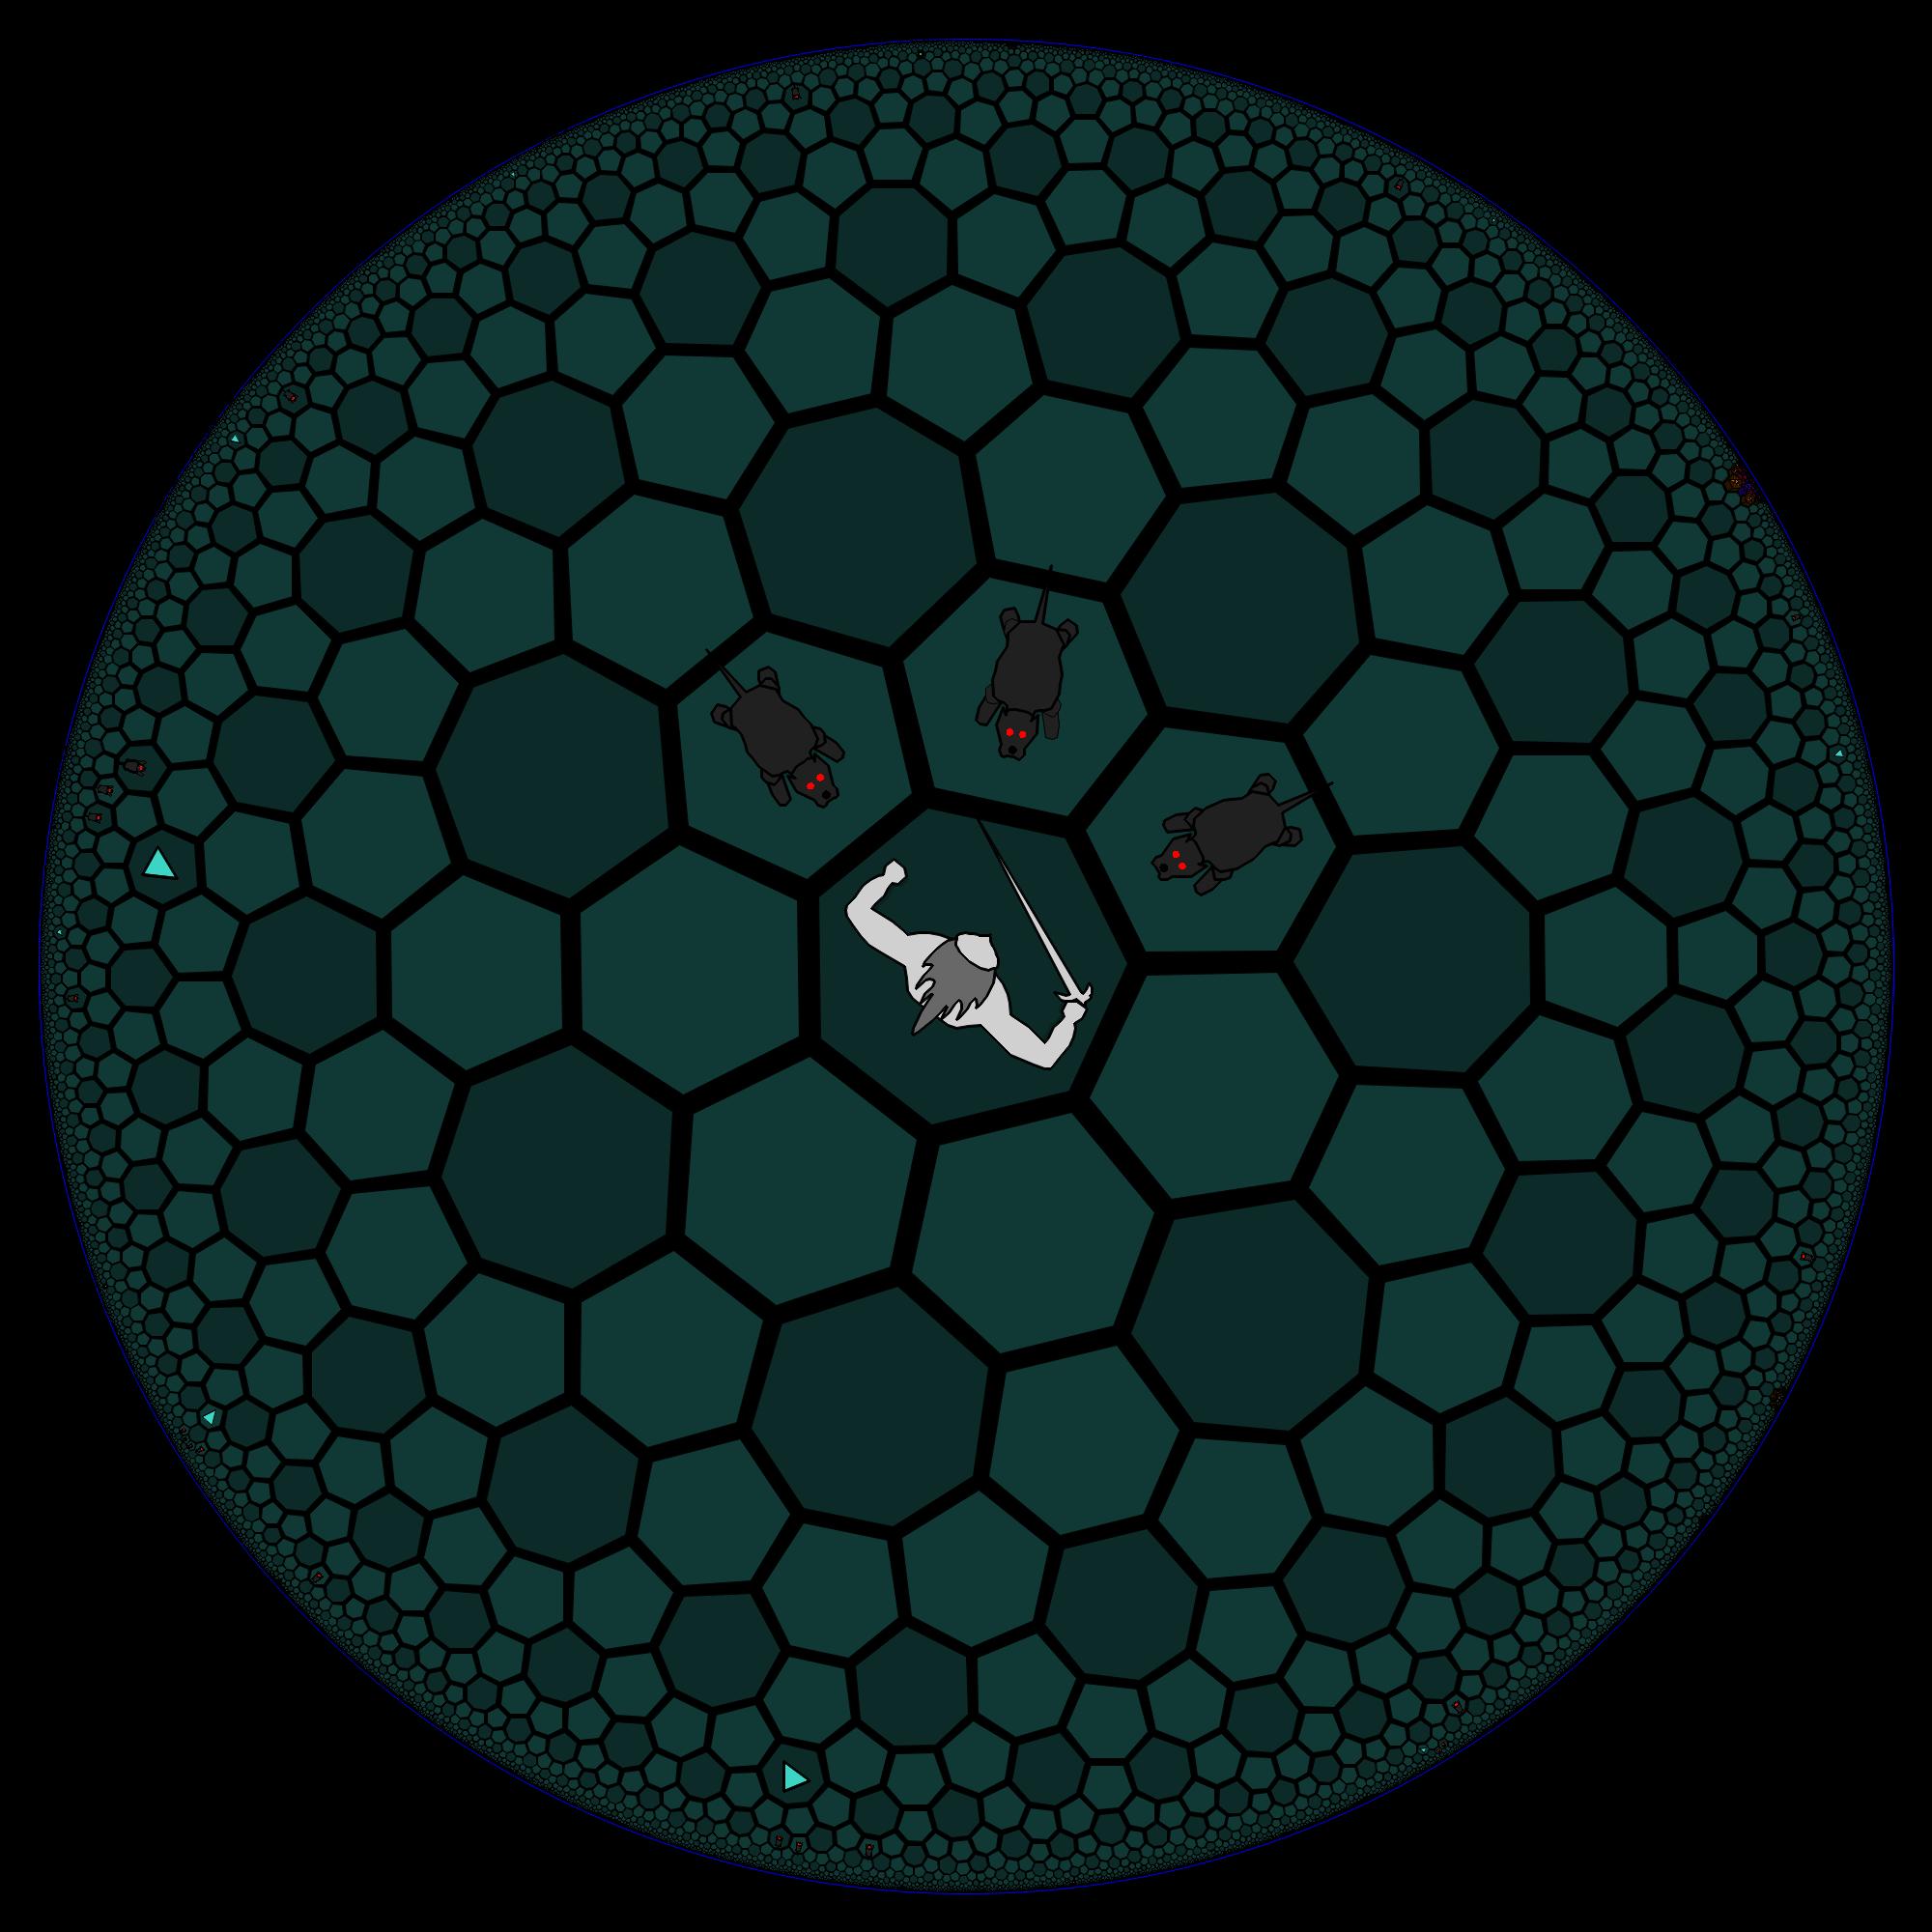 hyperbolic geometry in HyperRogue - Eye of Hydra